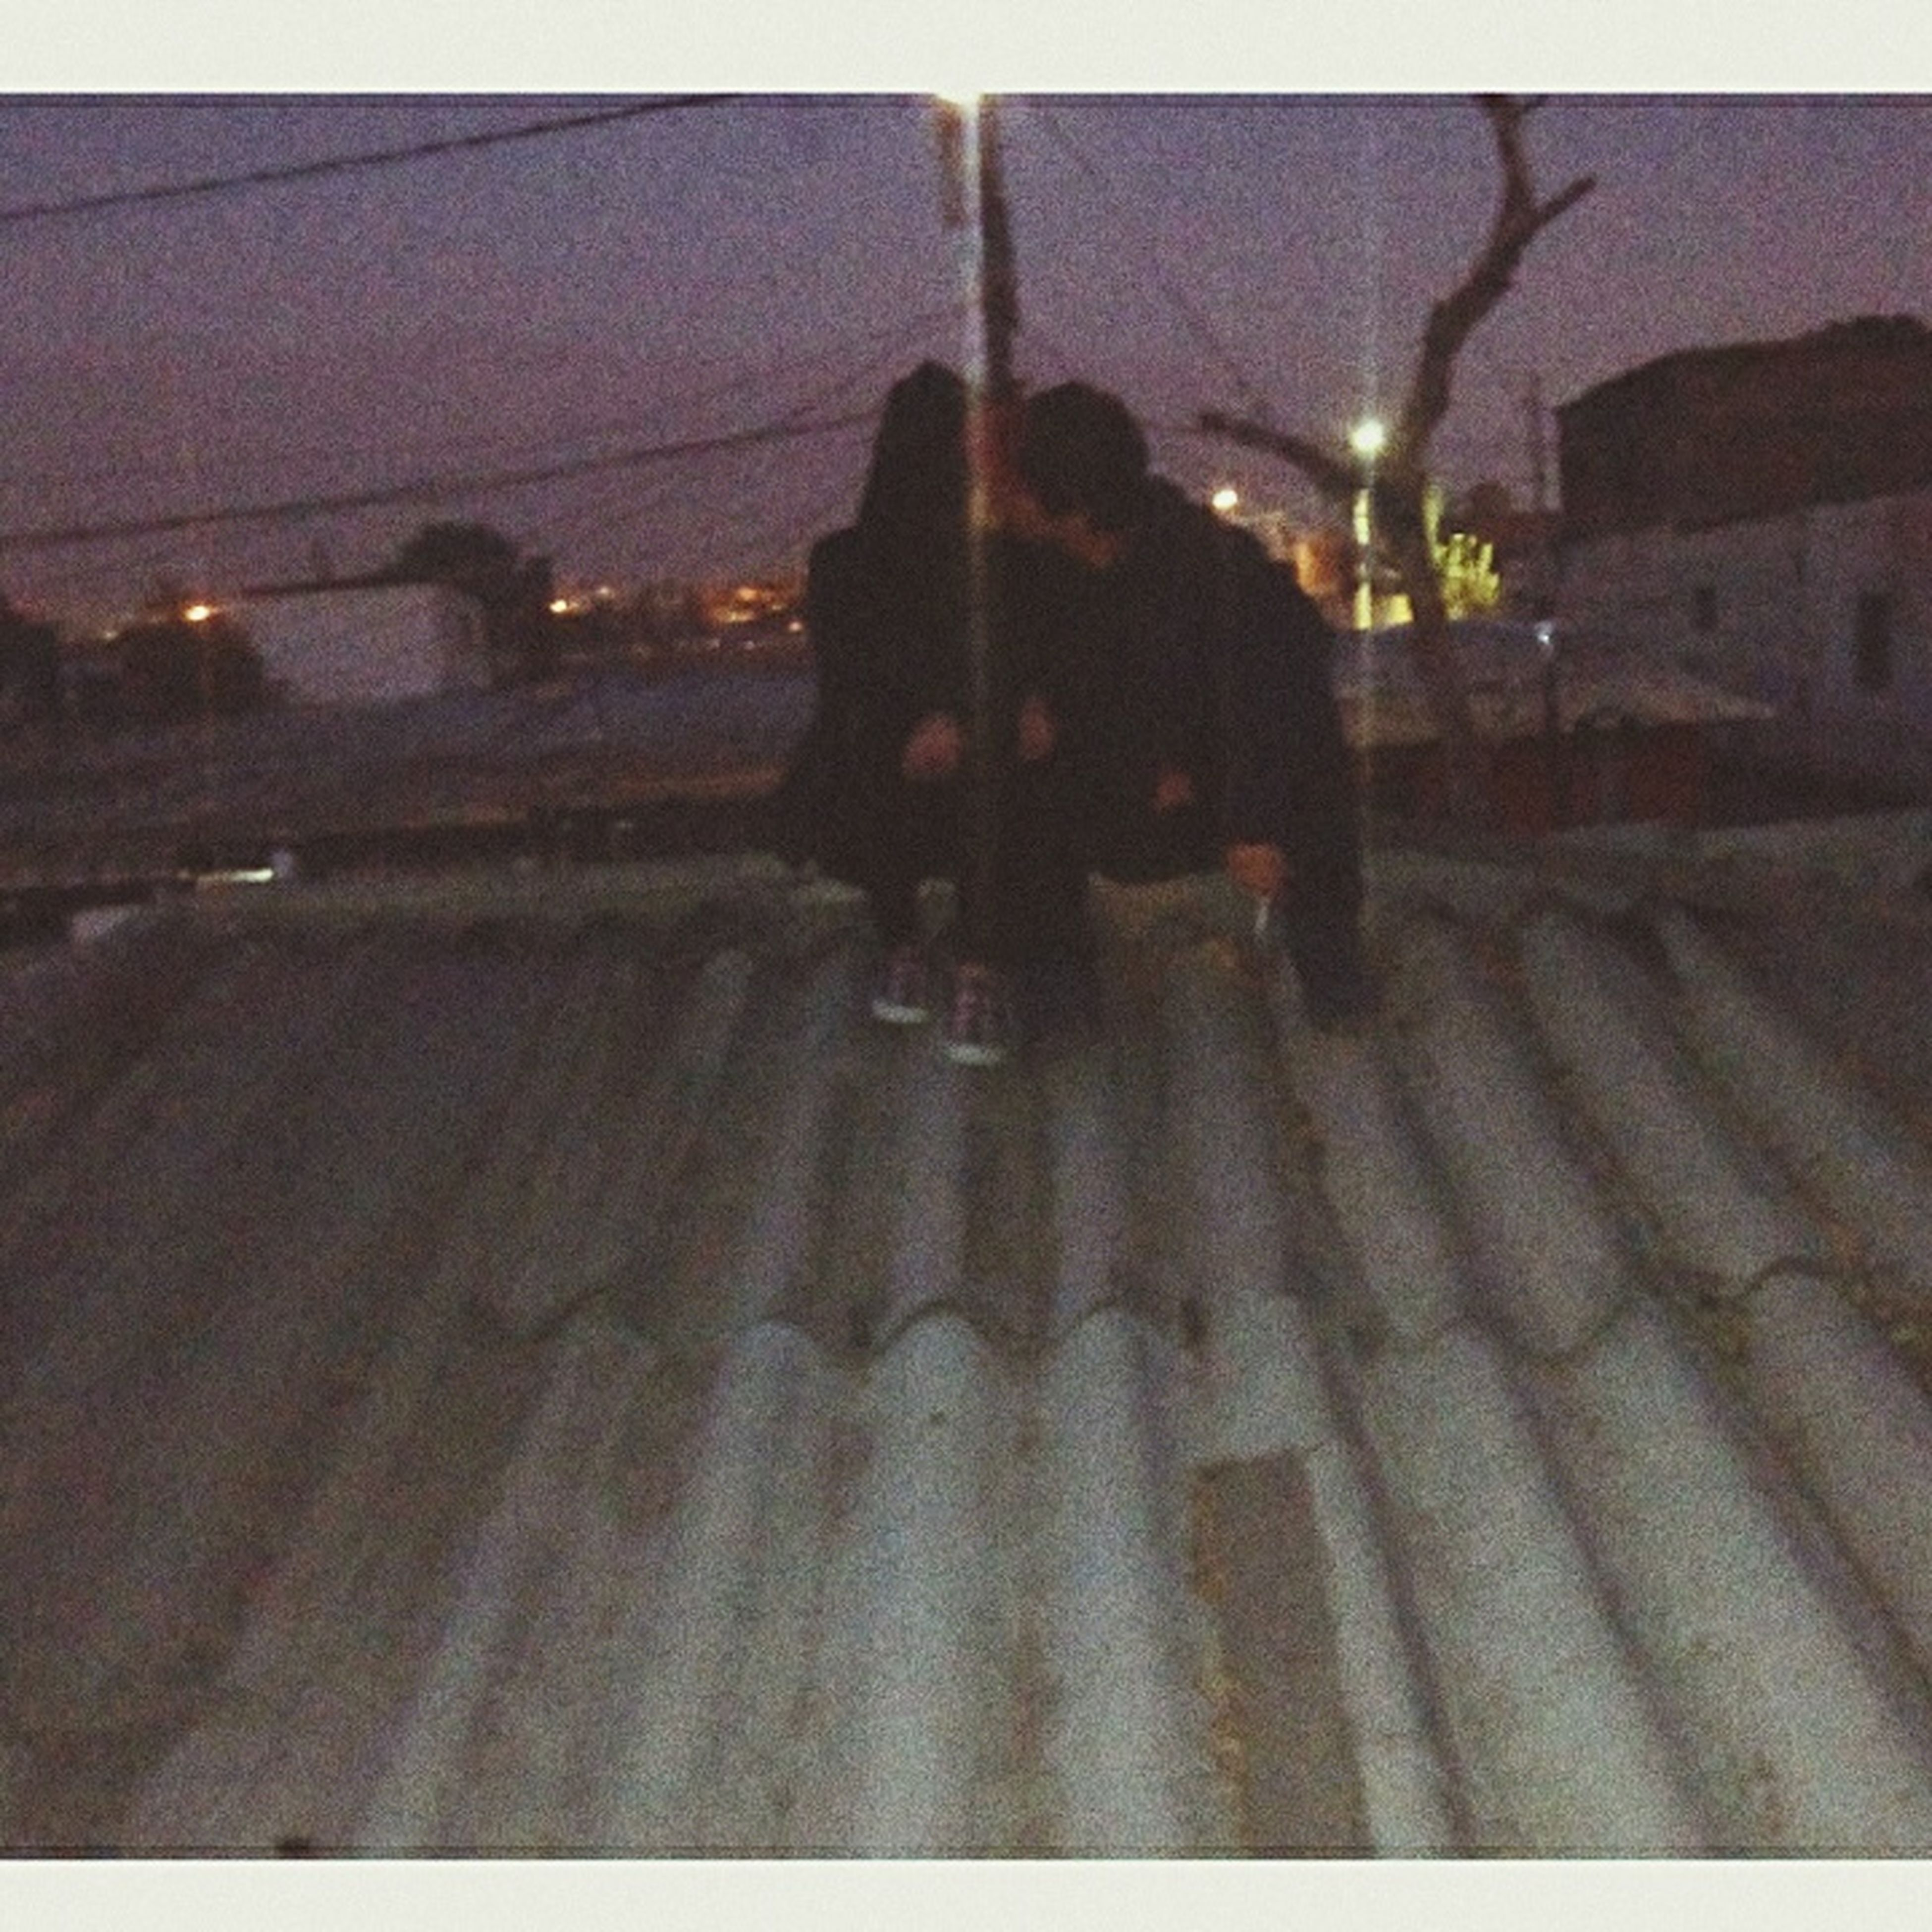 night, street light, illuminated, street, wet, transportation, road, lighting equipment, rain, weather, building exterior, built structure, season, silhouette, architecture, outdoors, city, sidewalk, snow, the way forward